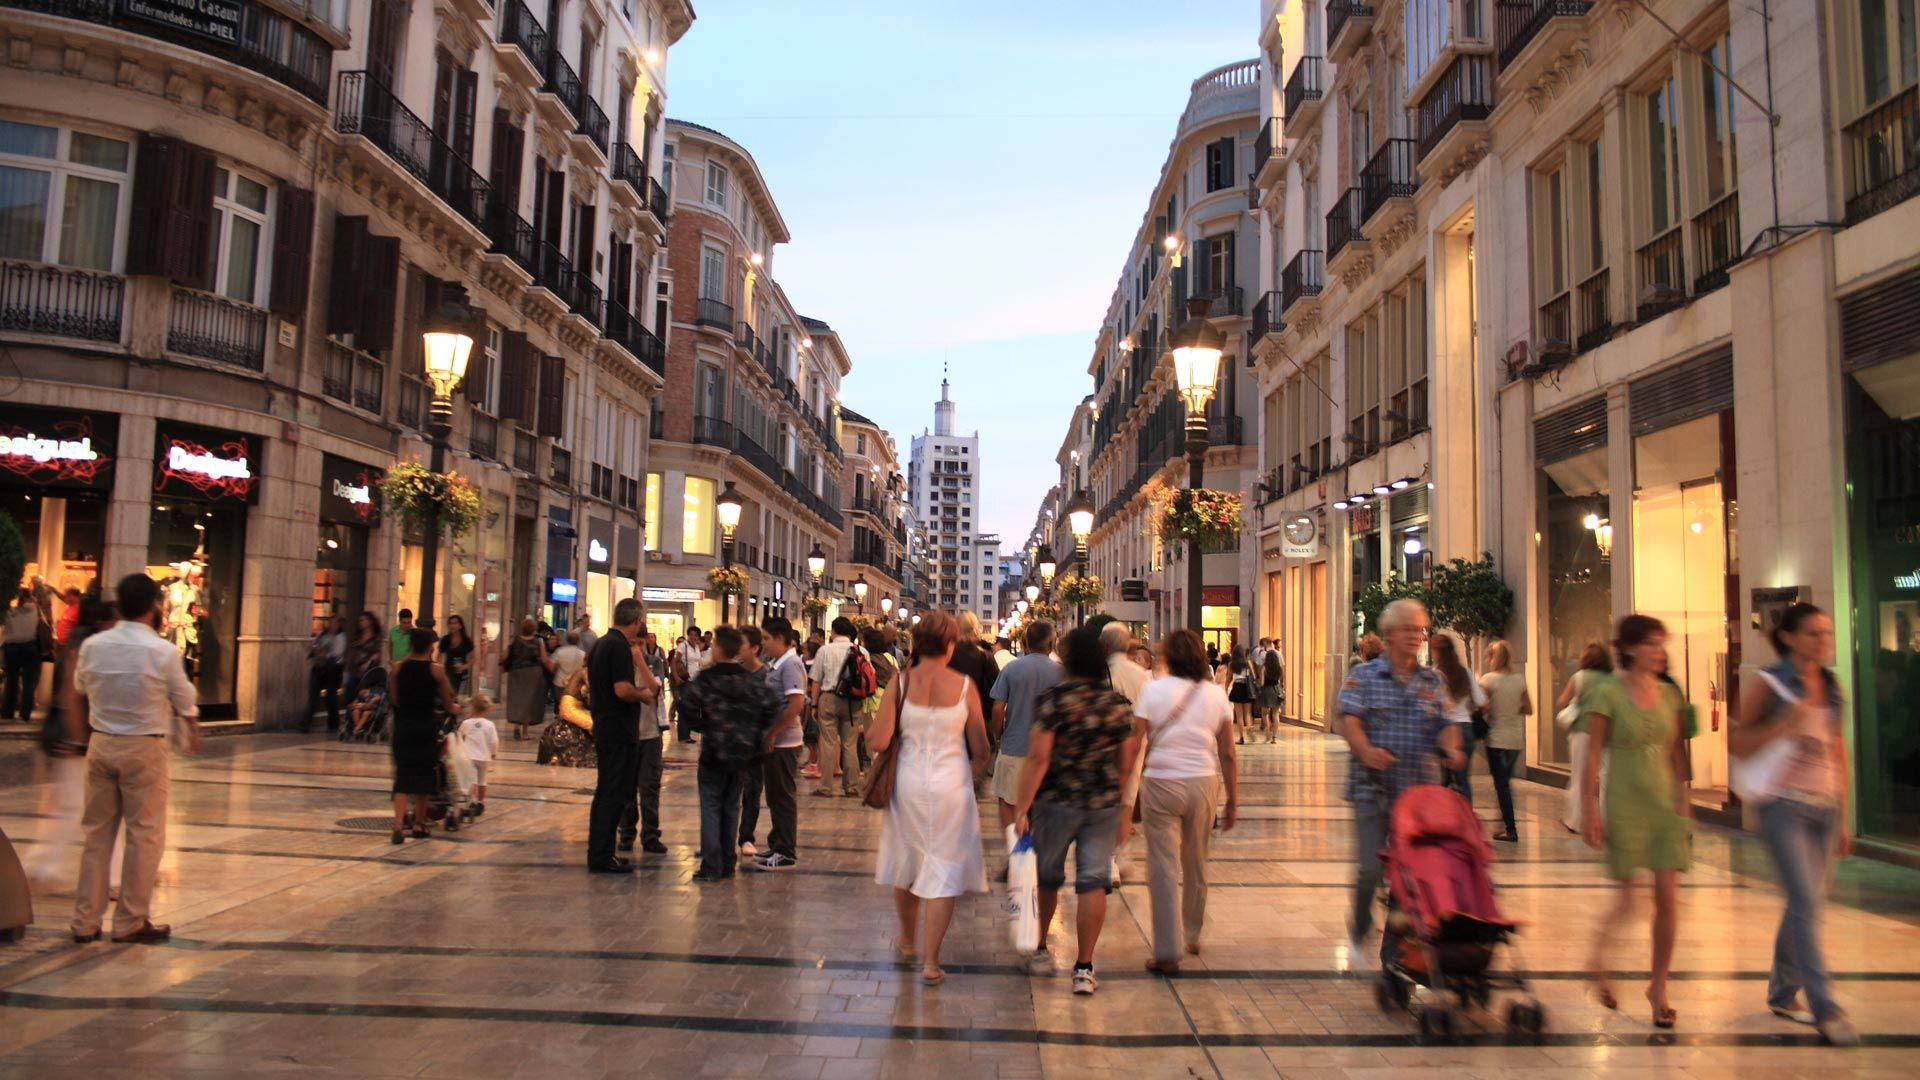 Rejser Til Malaga I 2021 Book Nu Pa Escapeaway Dk